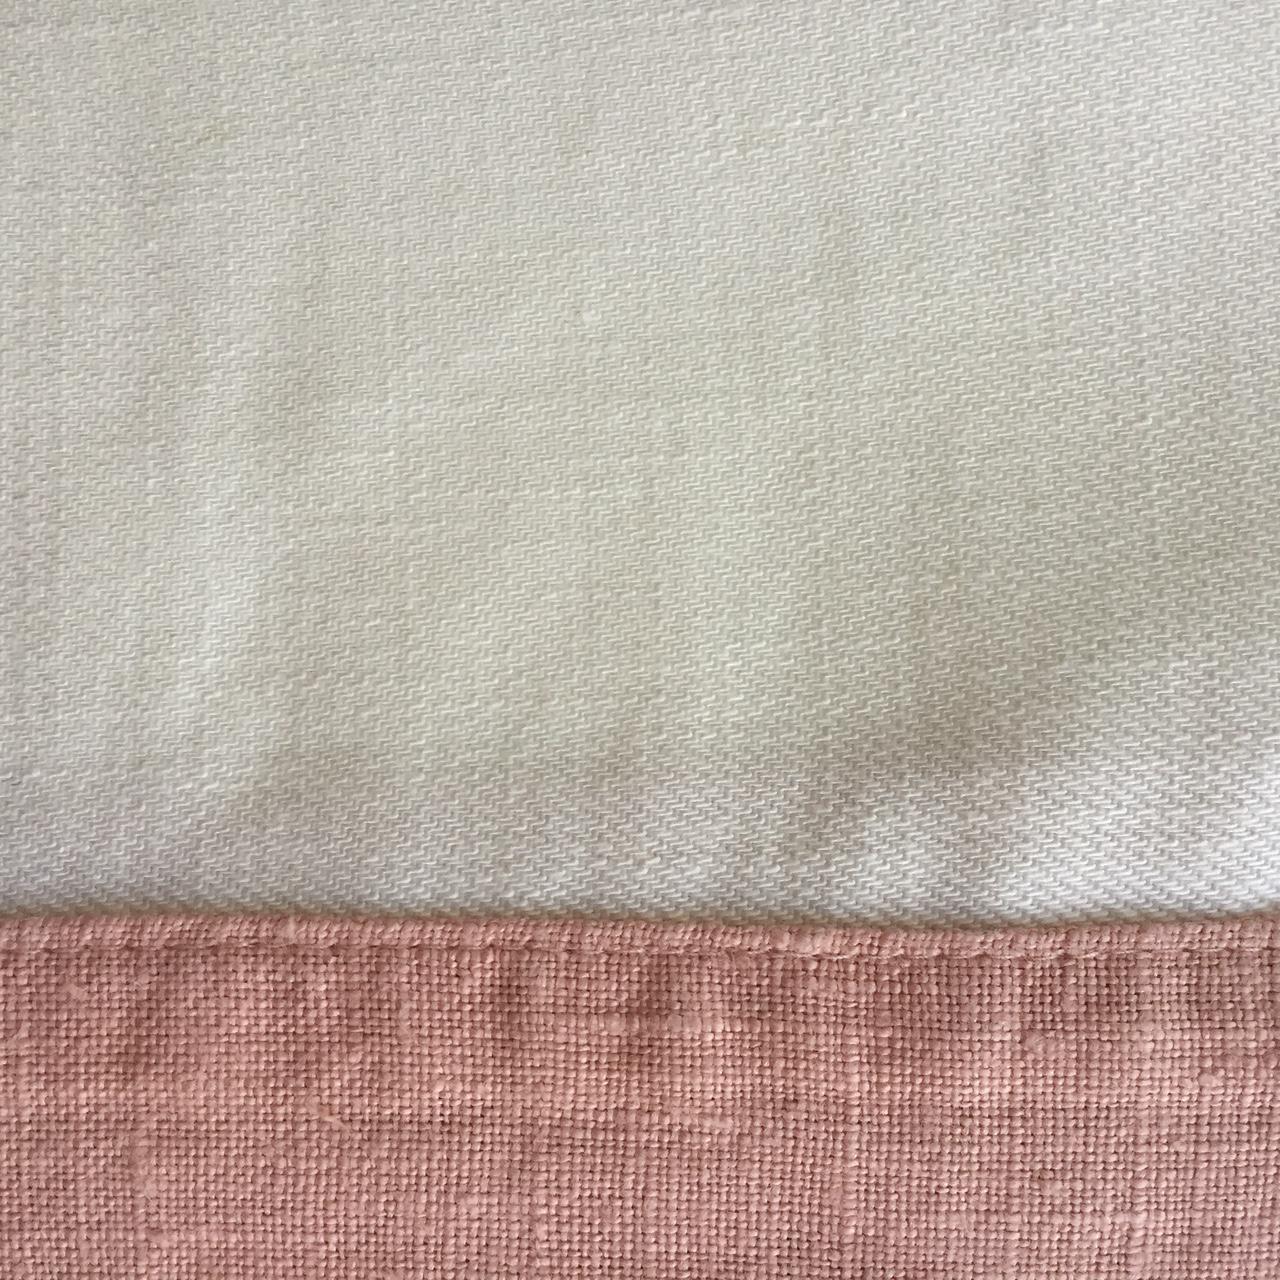 White Italian Linen with Dusty Rose Linen Border